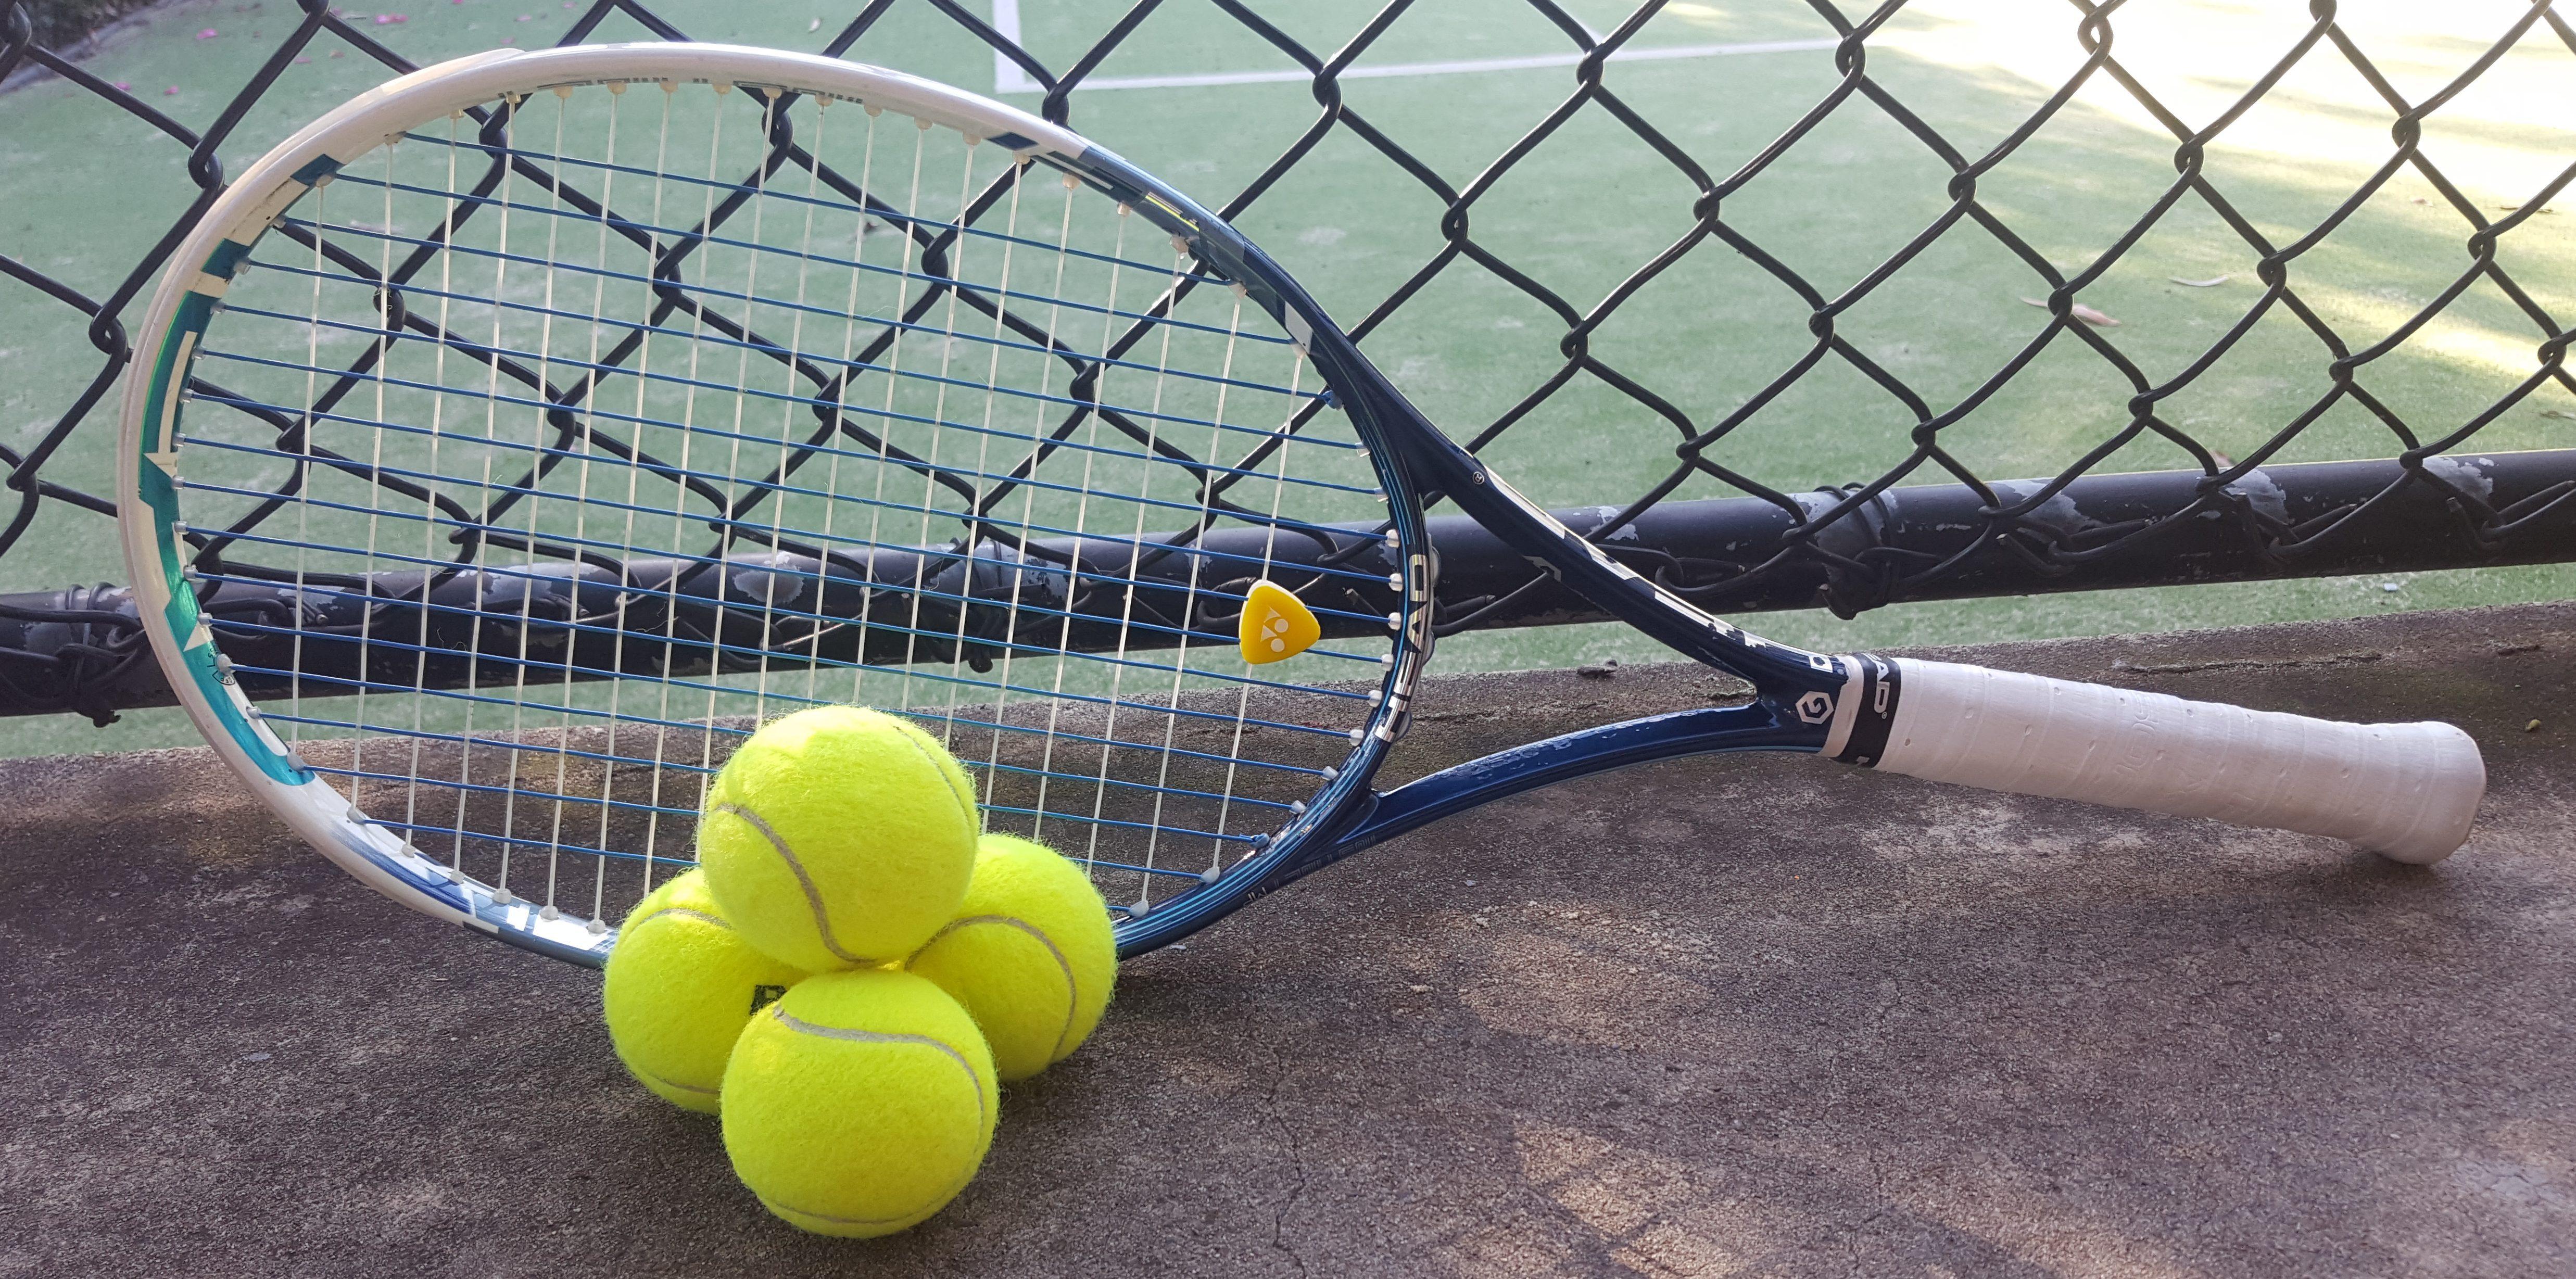 North Rocks Tennis Club